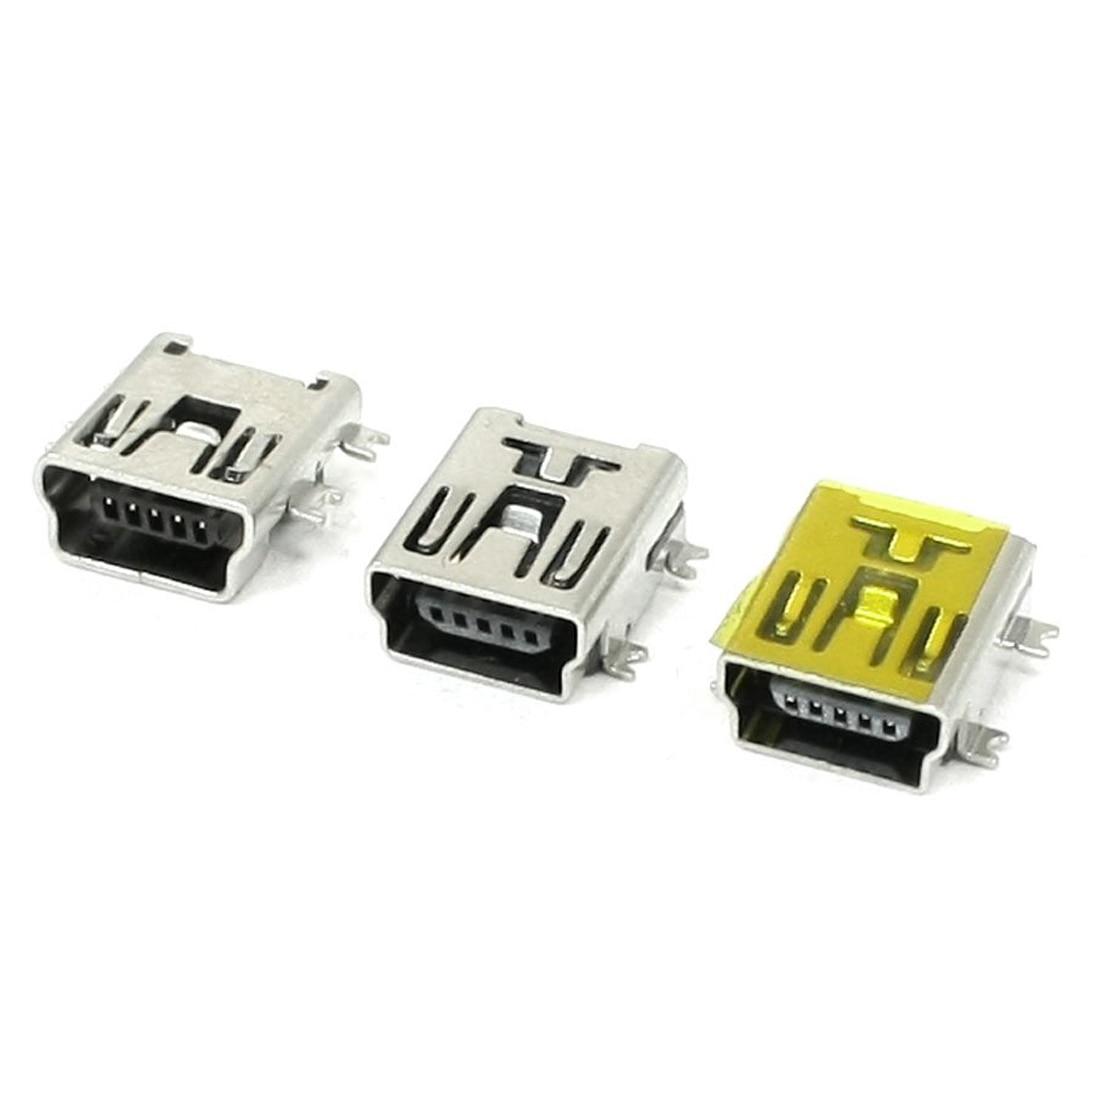 10 Pcs Micro USB Type B Socket 180 Degree 5-Pin SMD SMT Soldering TS